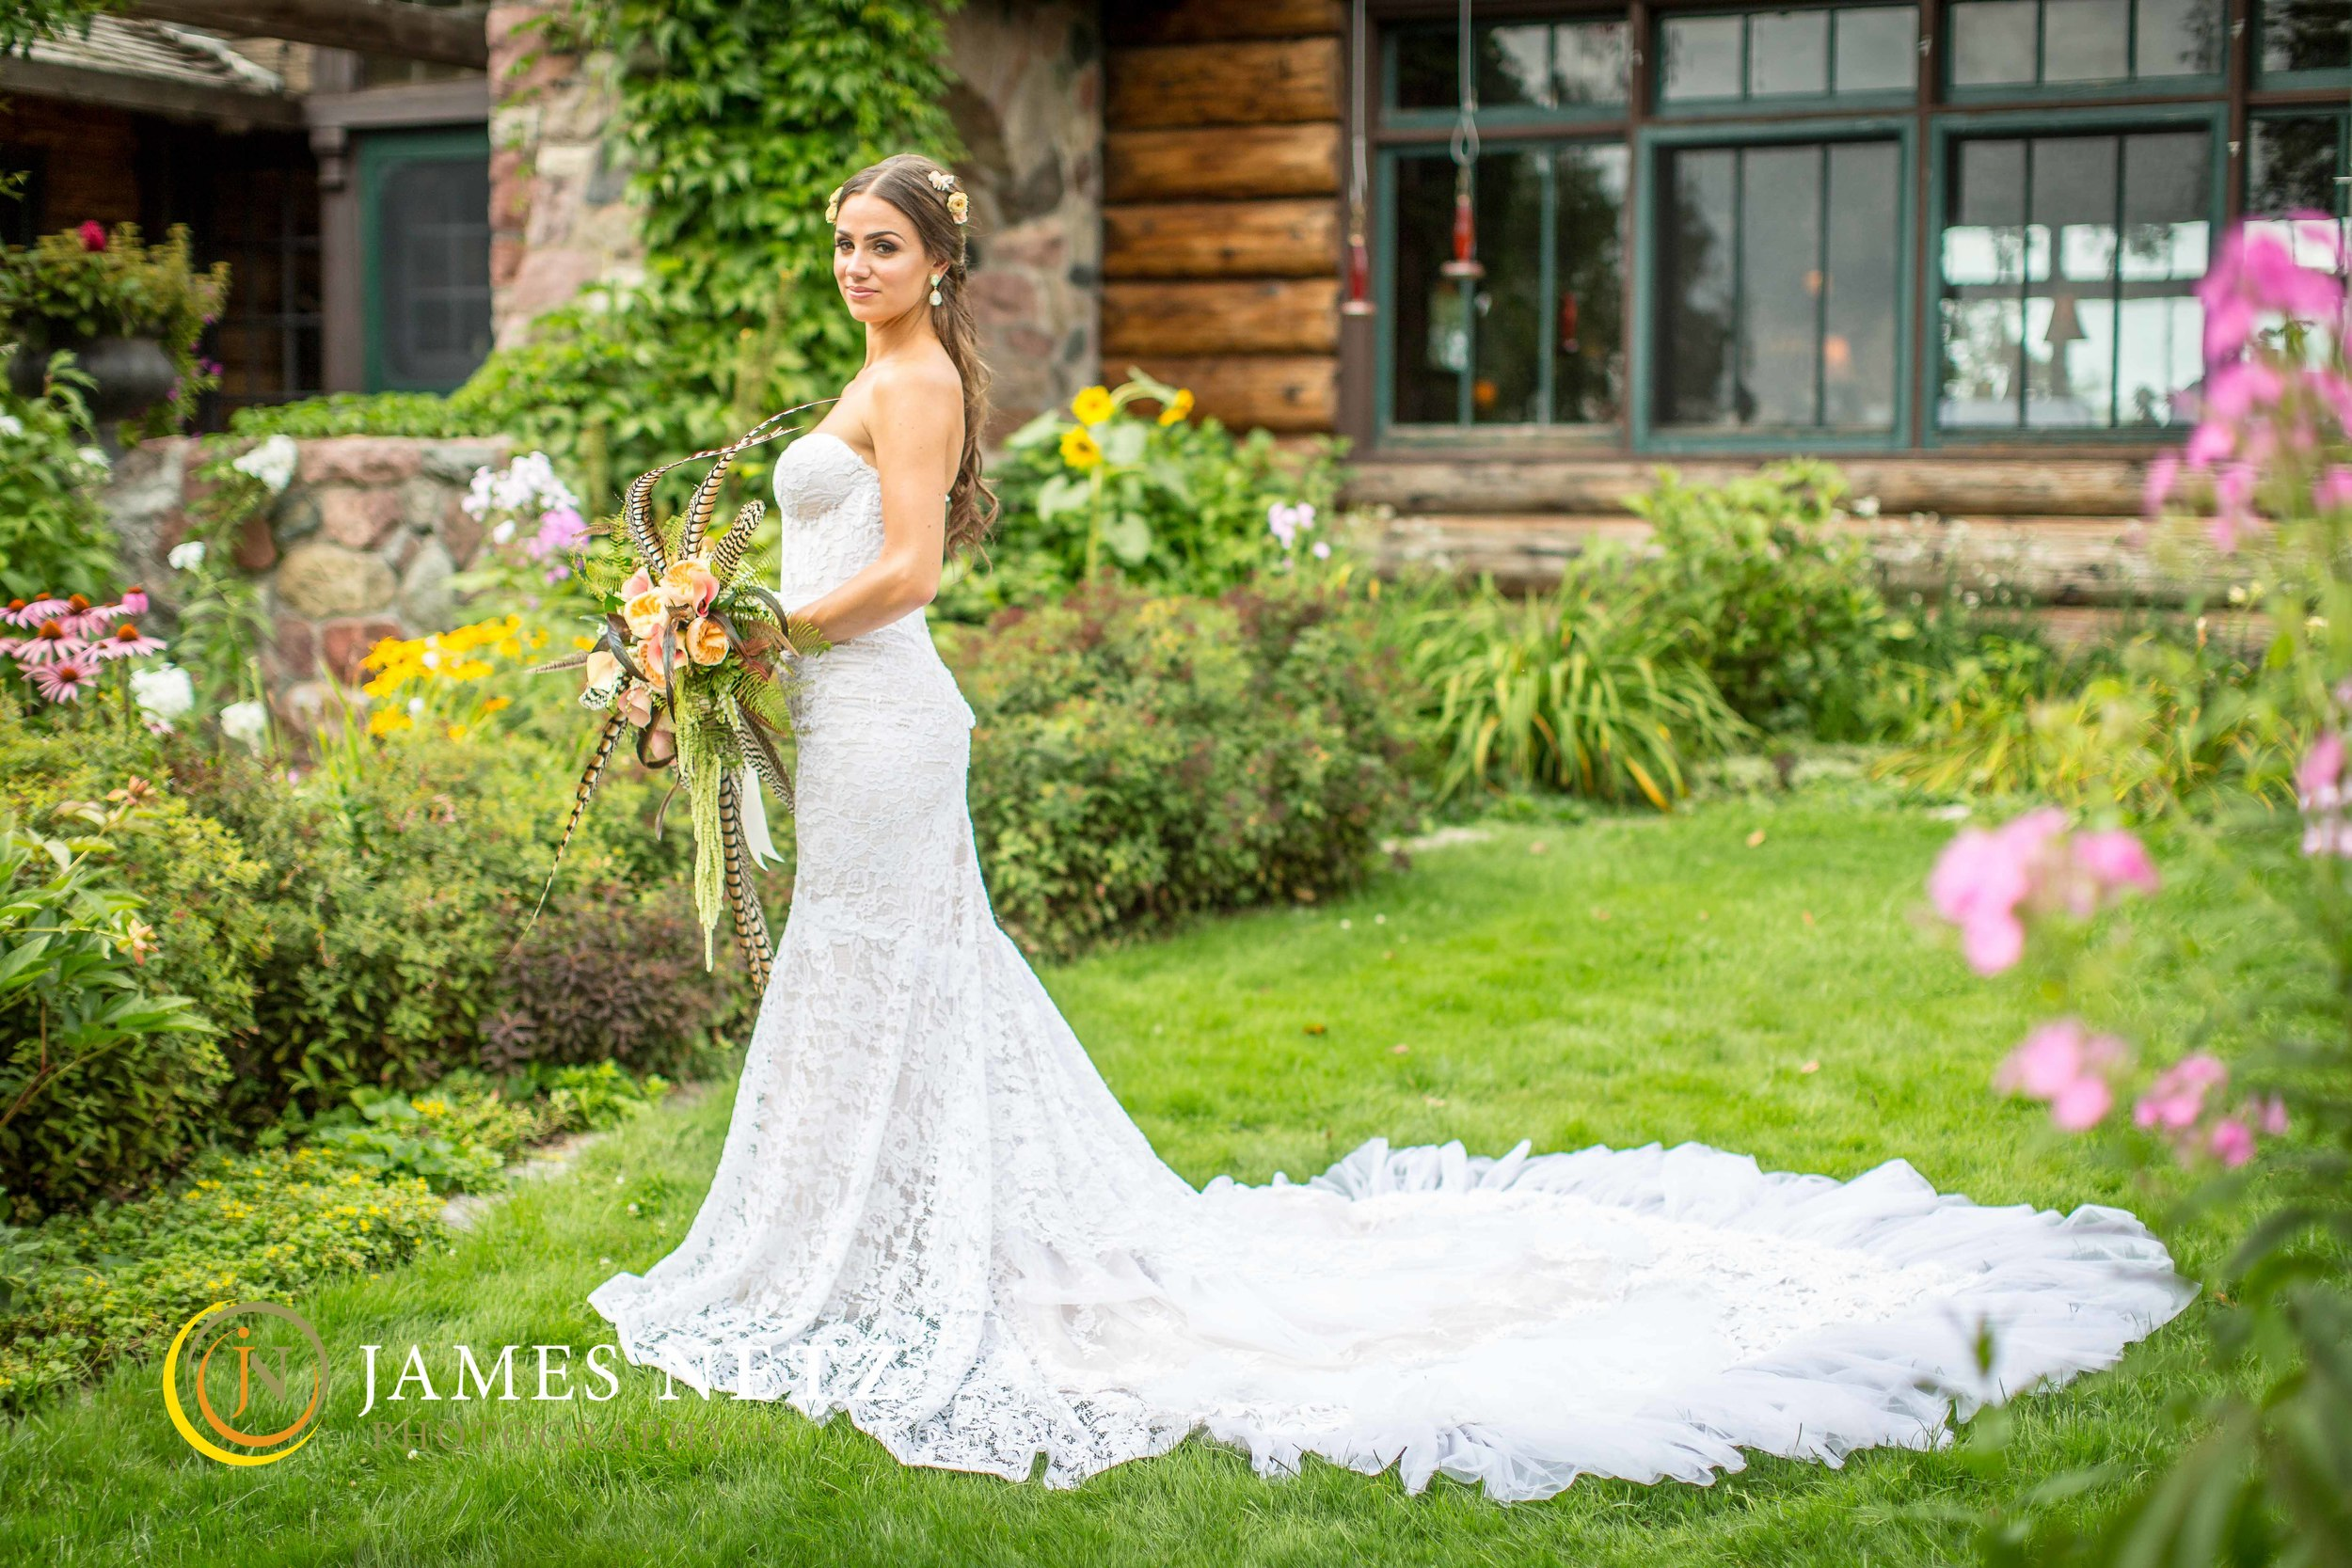 Wedding Planning . James Netz Photography.